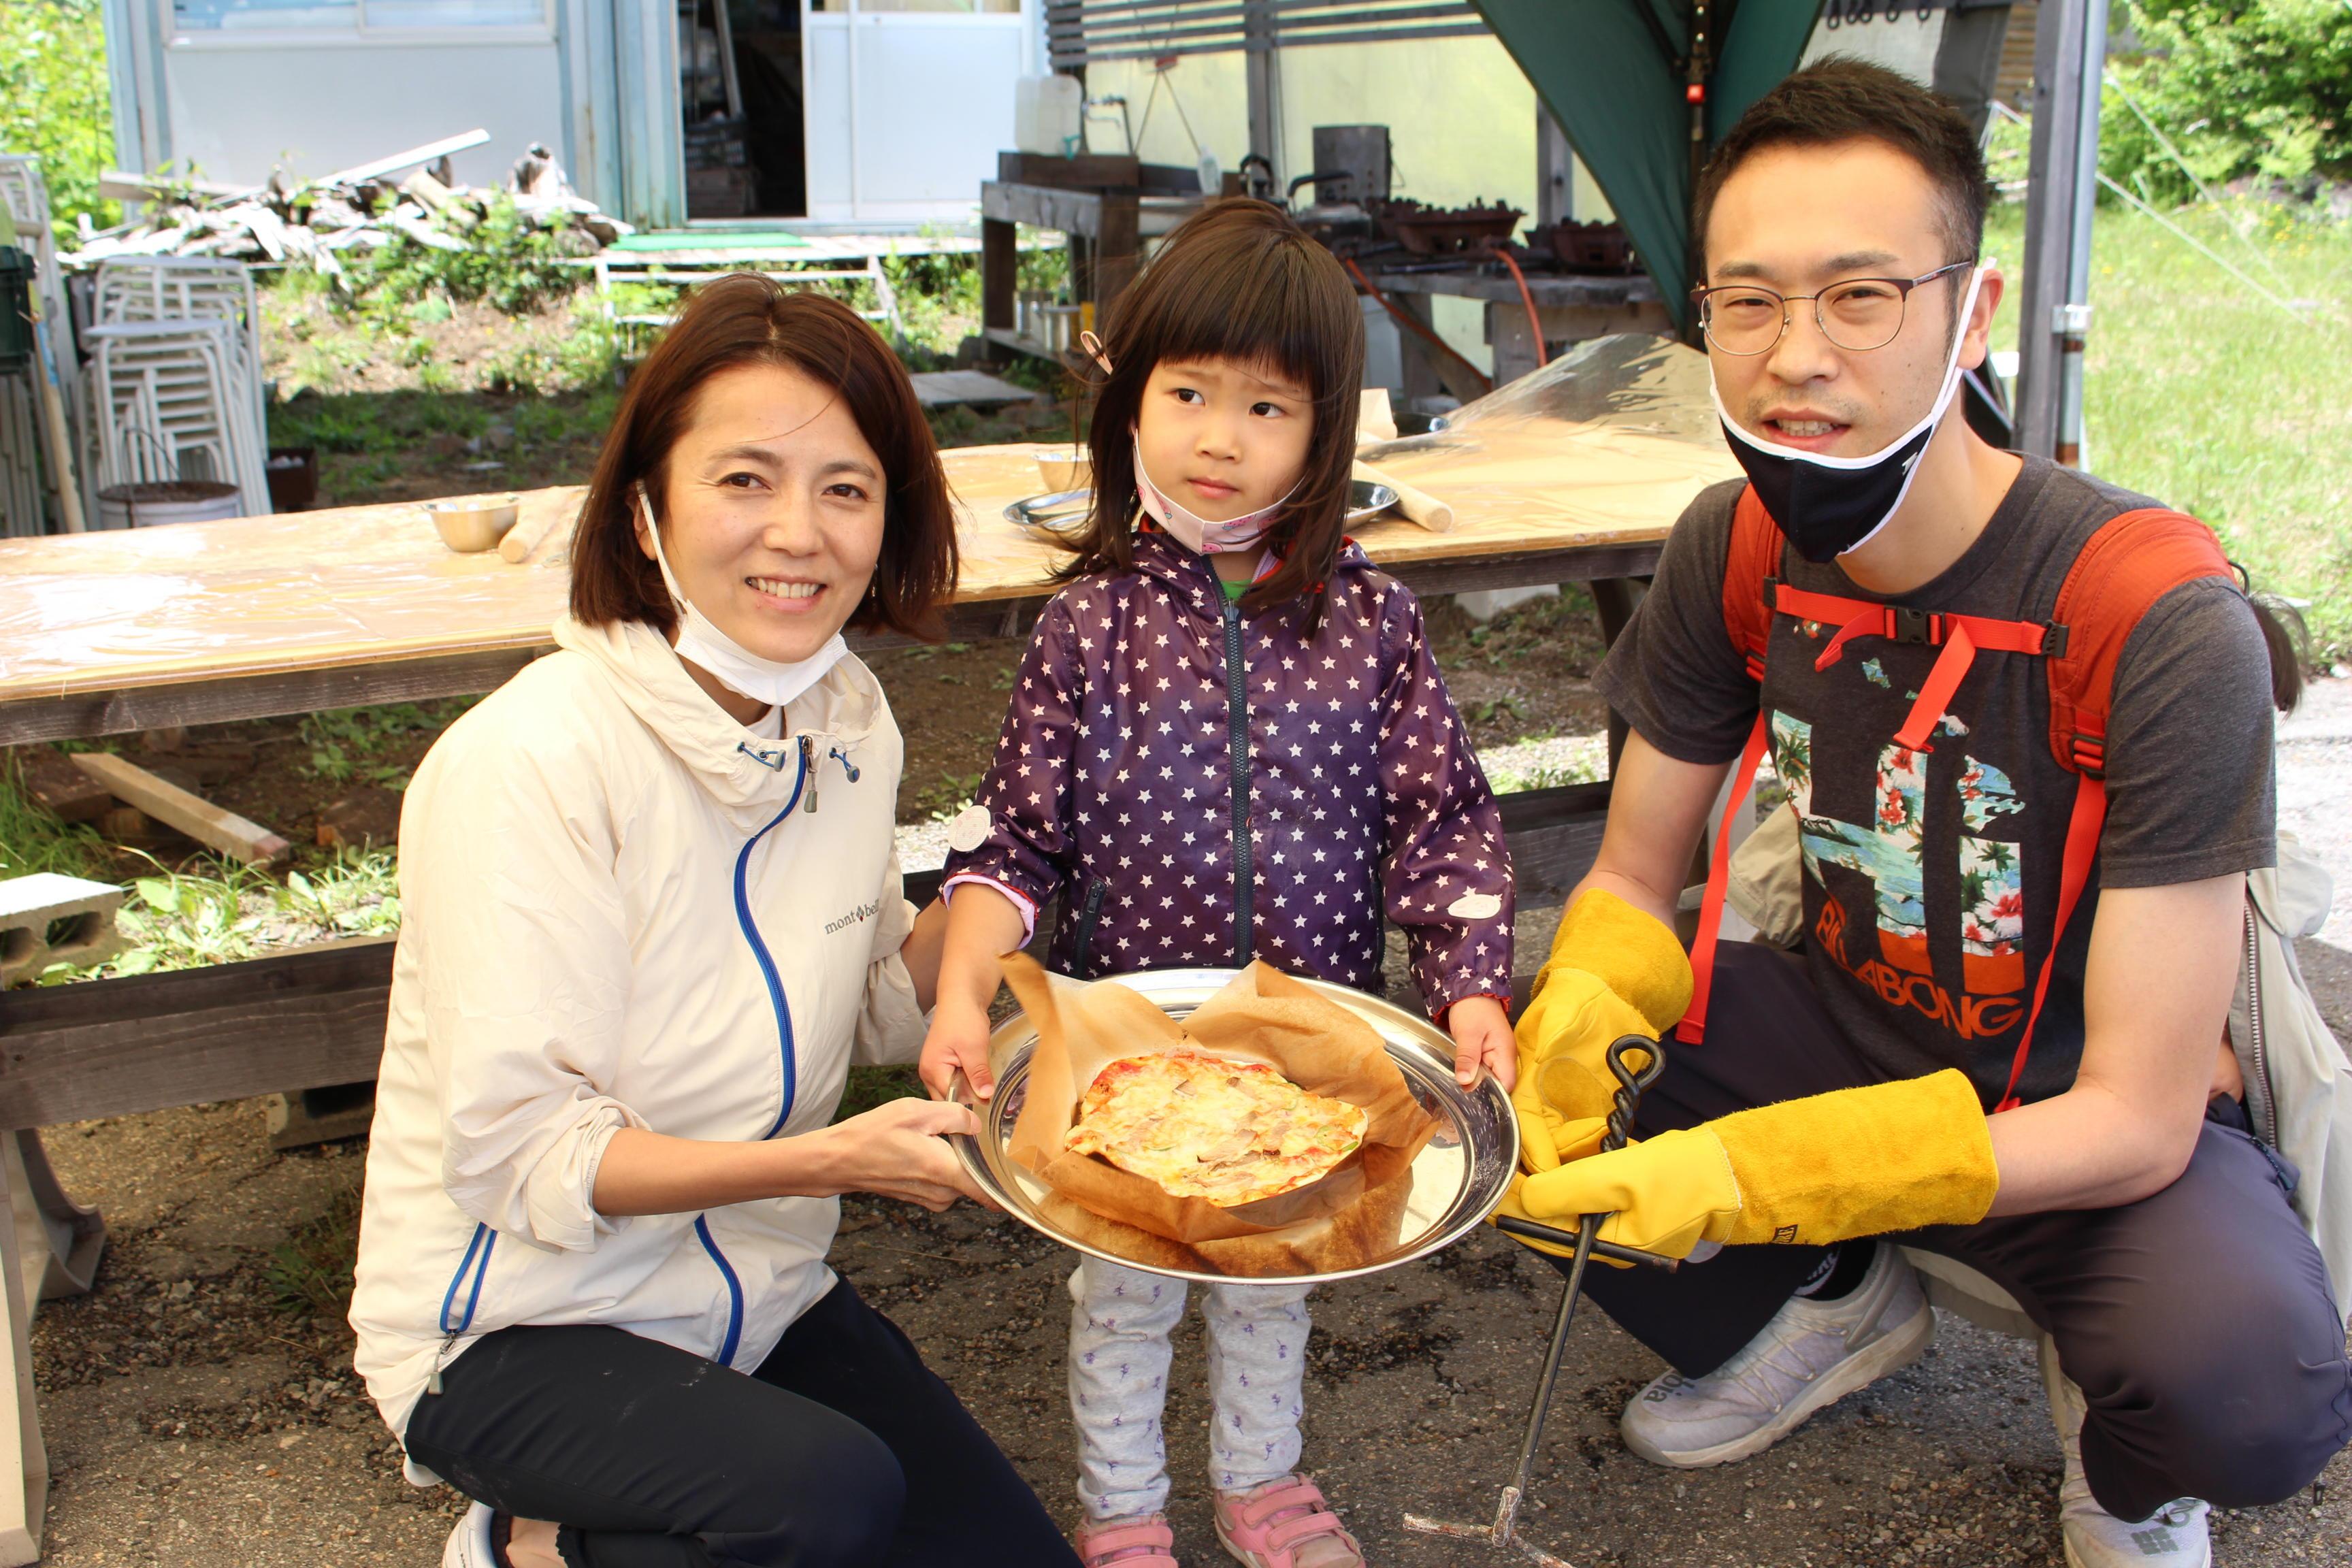 https://www.muji.net/camp/minaminorikura/blog/bIMG_1162.JPG